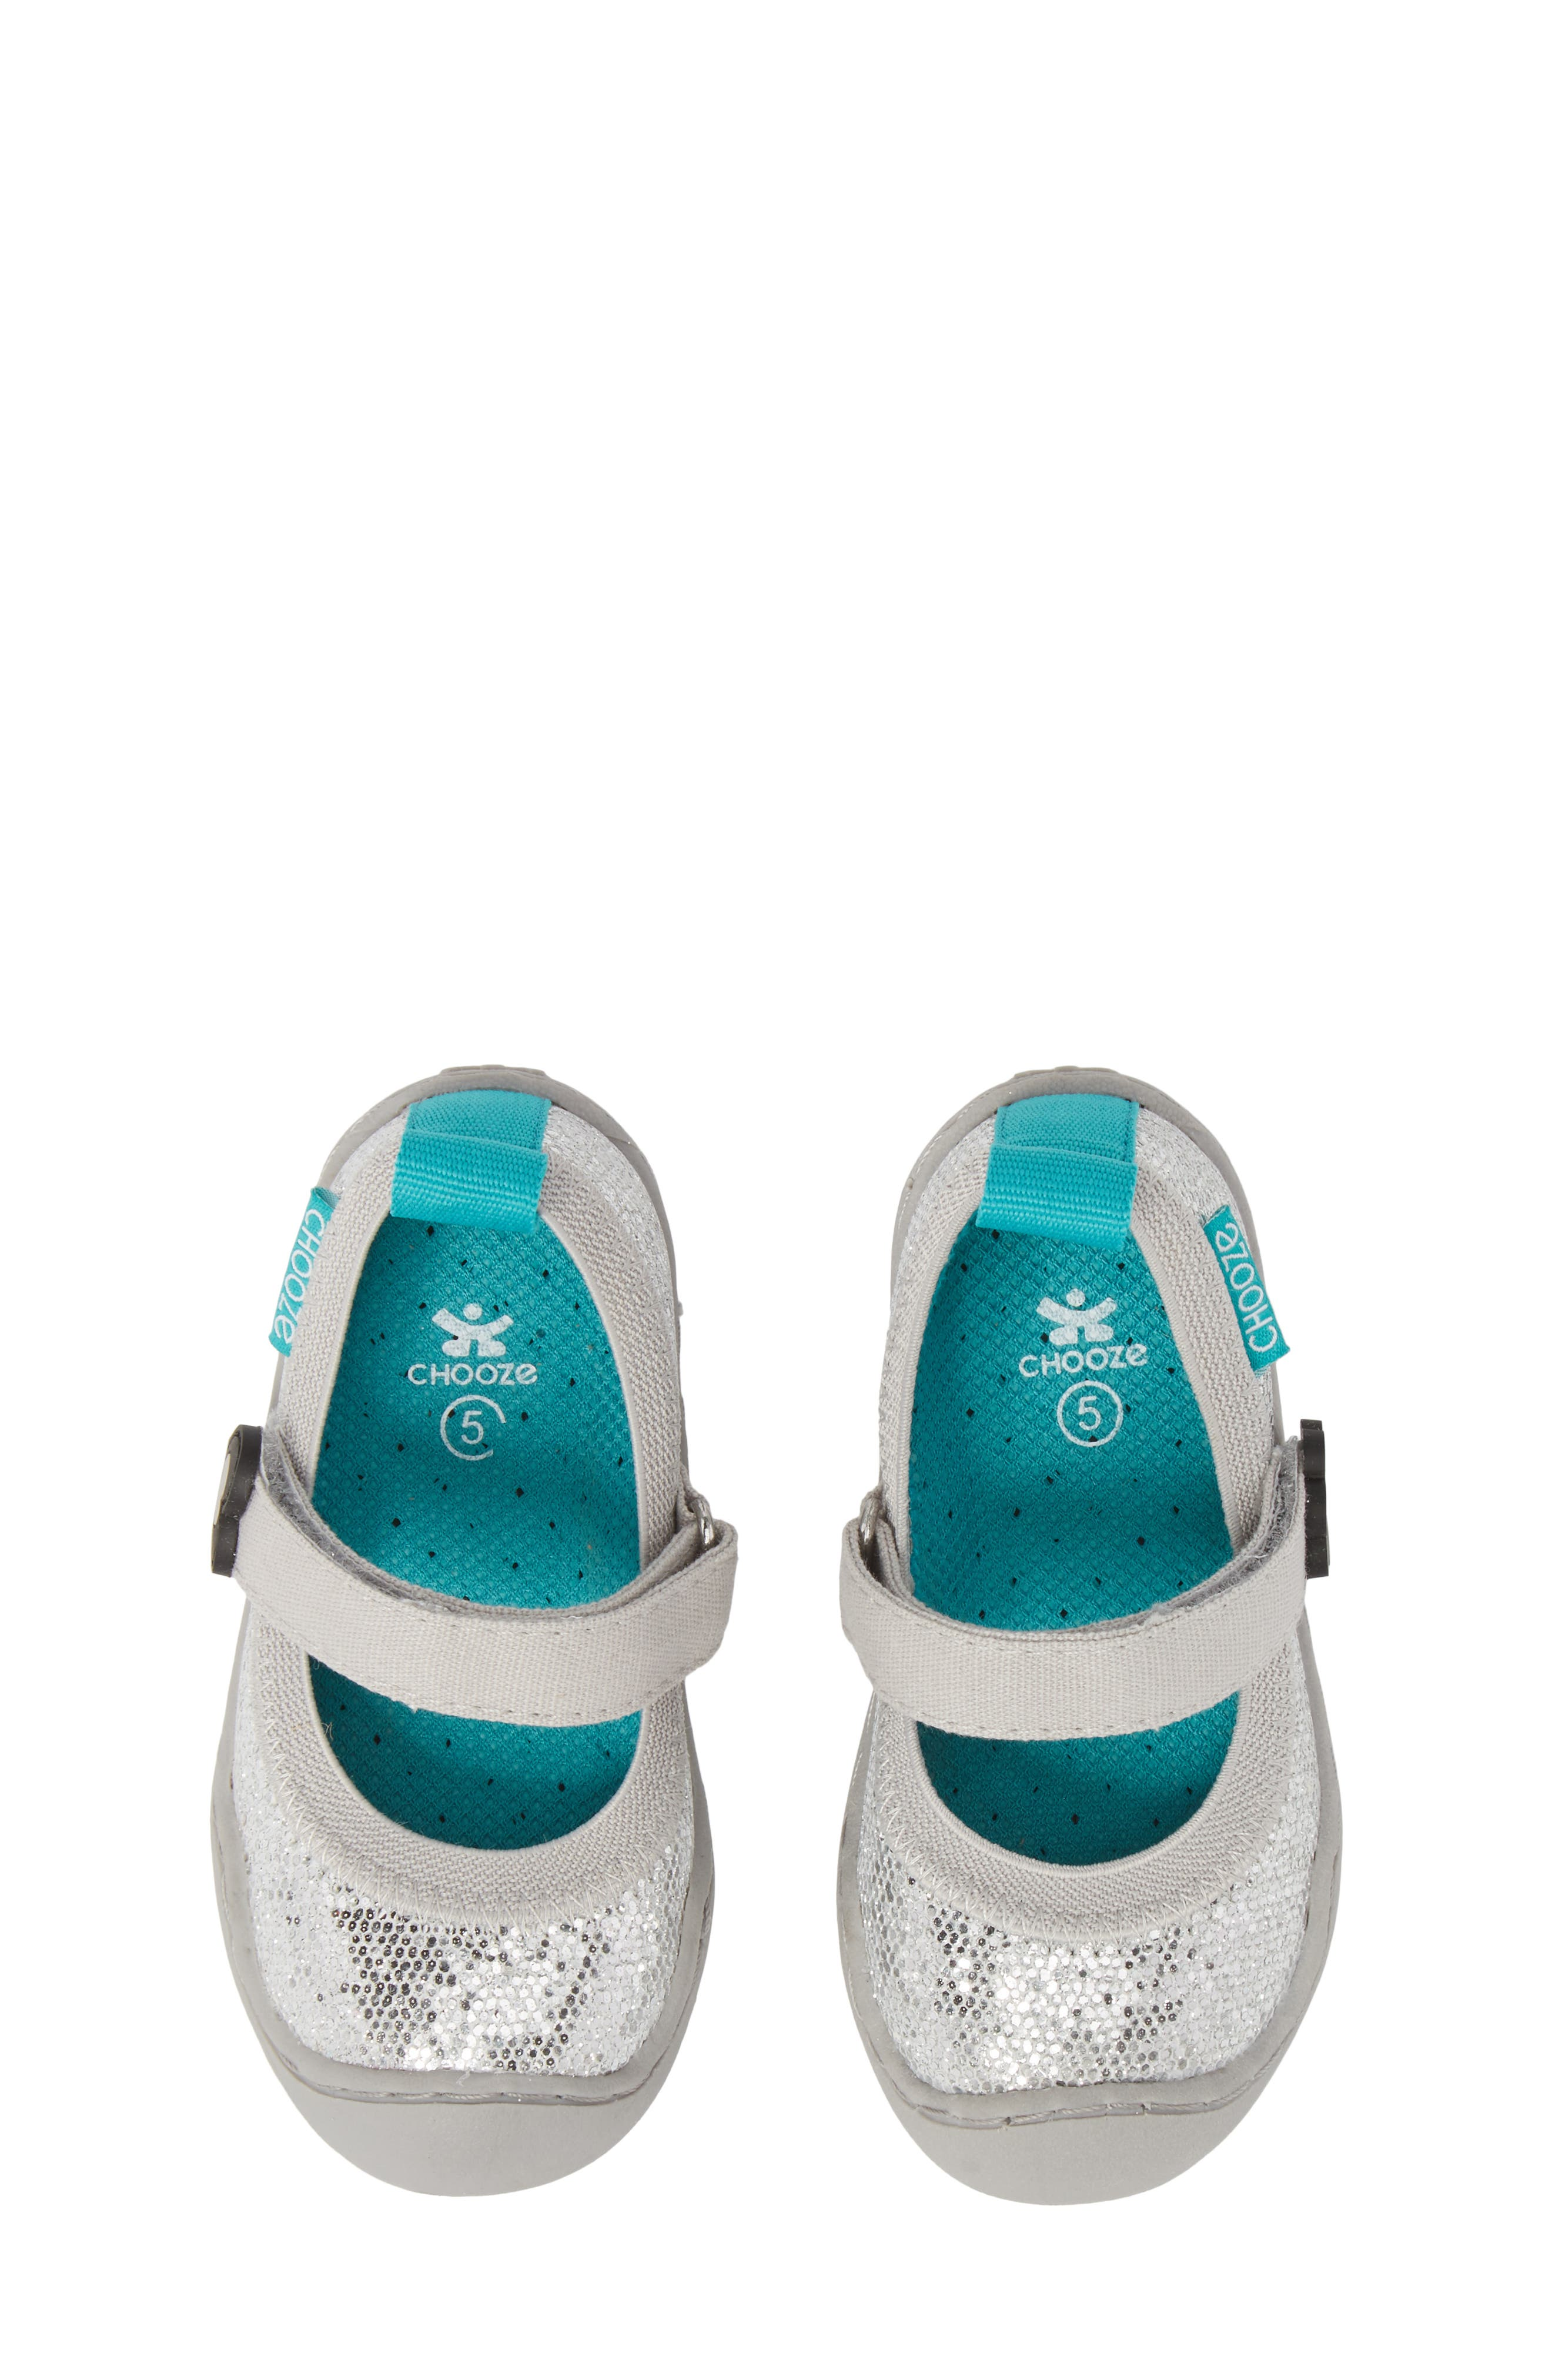 CHOOZE Steady Shimmer Mary Jane Sneaker (Baby, Walker, Toddler & Little Kid)